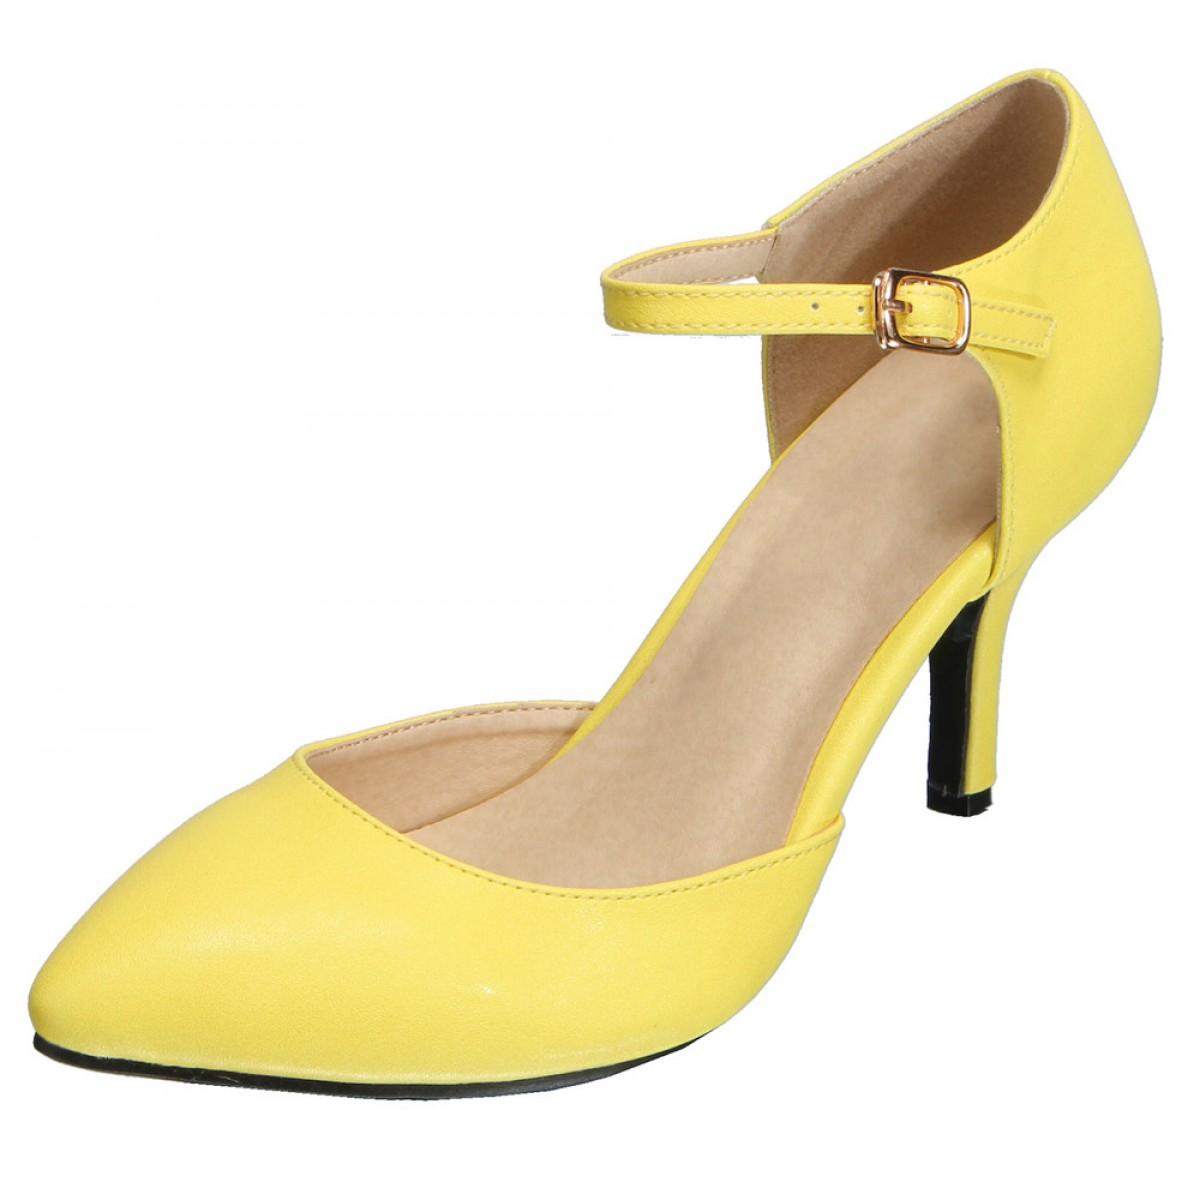 SEXYHER Womens Fashion 2.2 Inches Kitten Heel Office ...